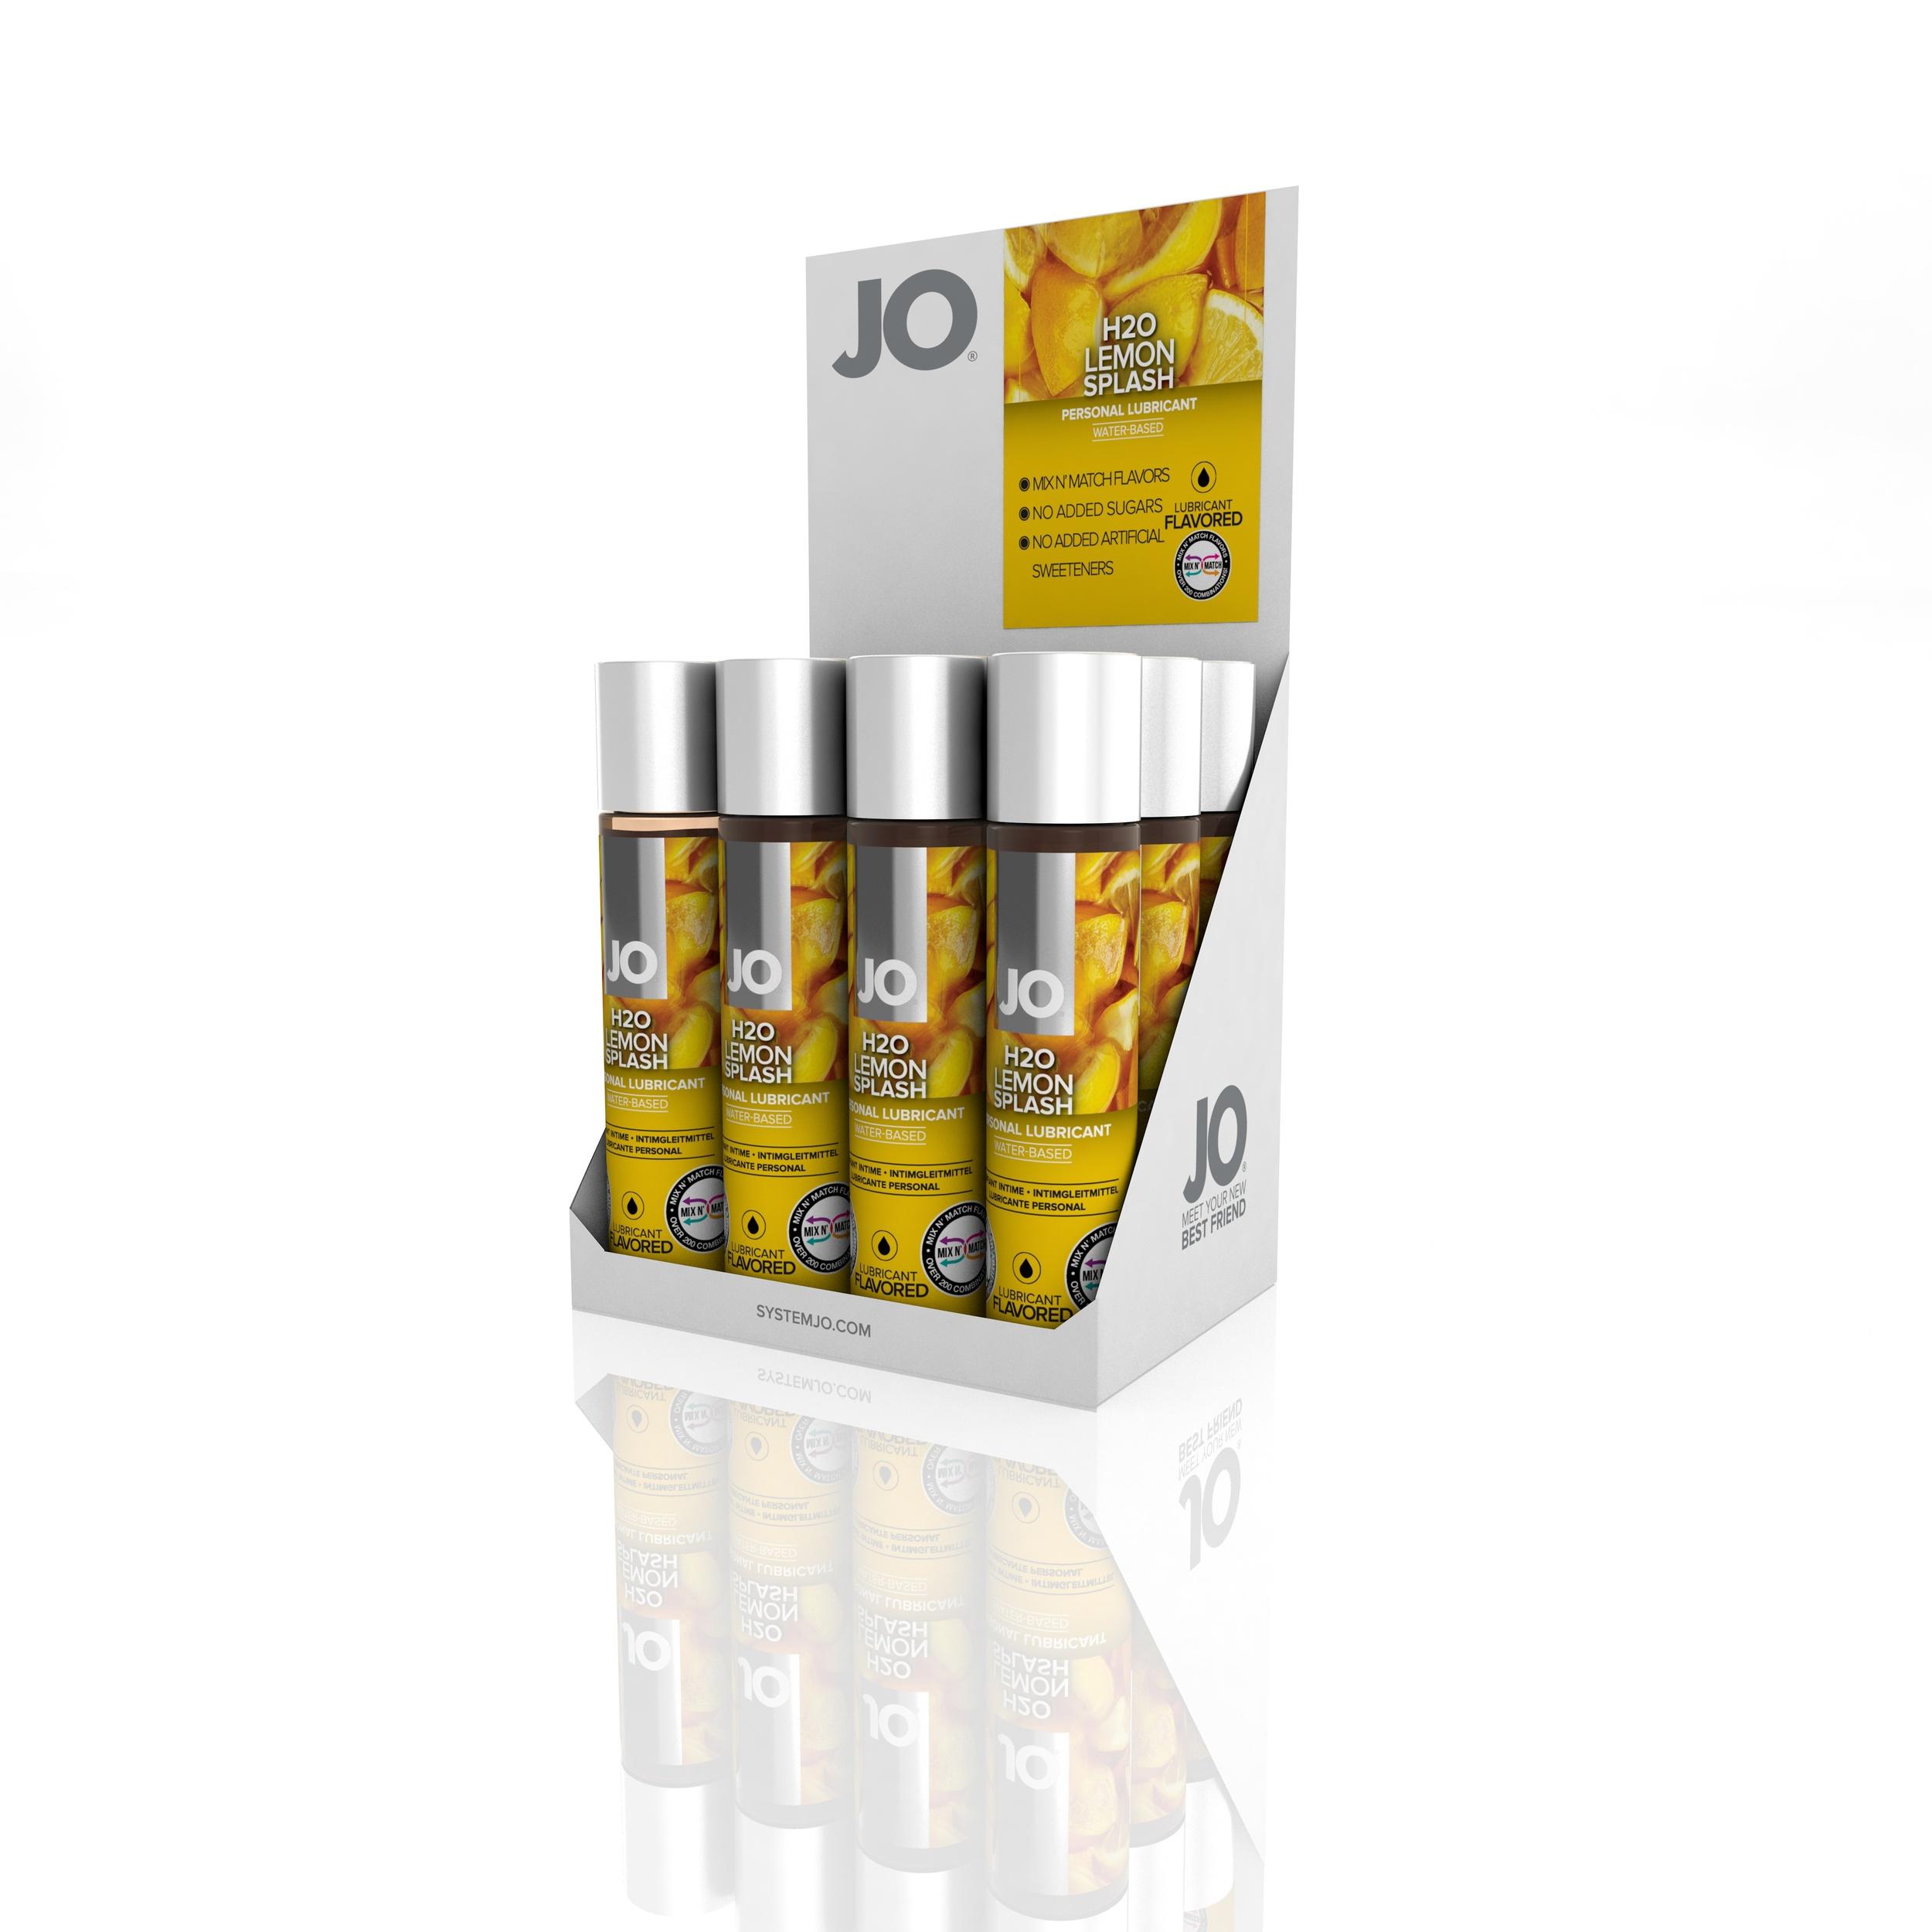 10120 - JO H2O FLAVORED LUBRICANT - LEMON SPLASH - 1fl.oz 30mL (MOQ 12 units - Includes Counter Display).jpg